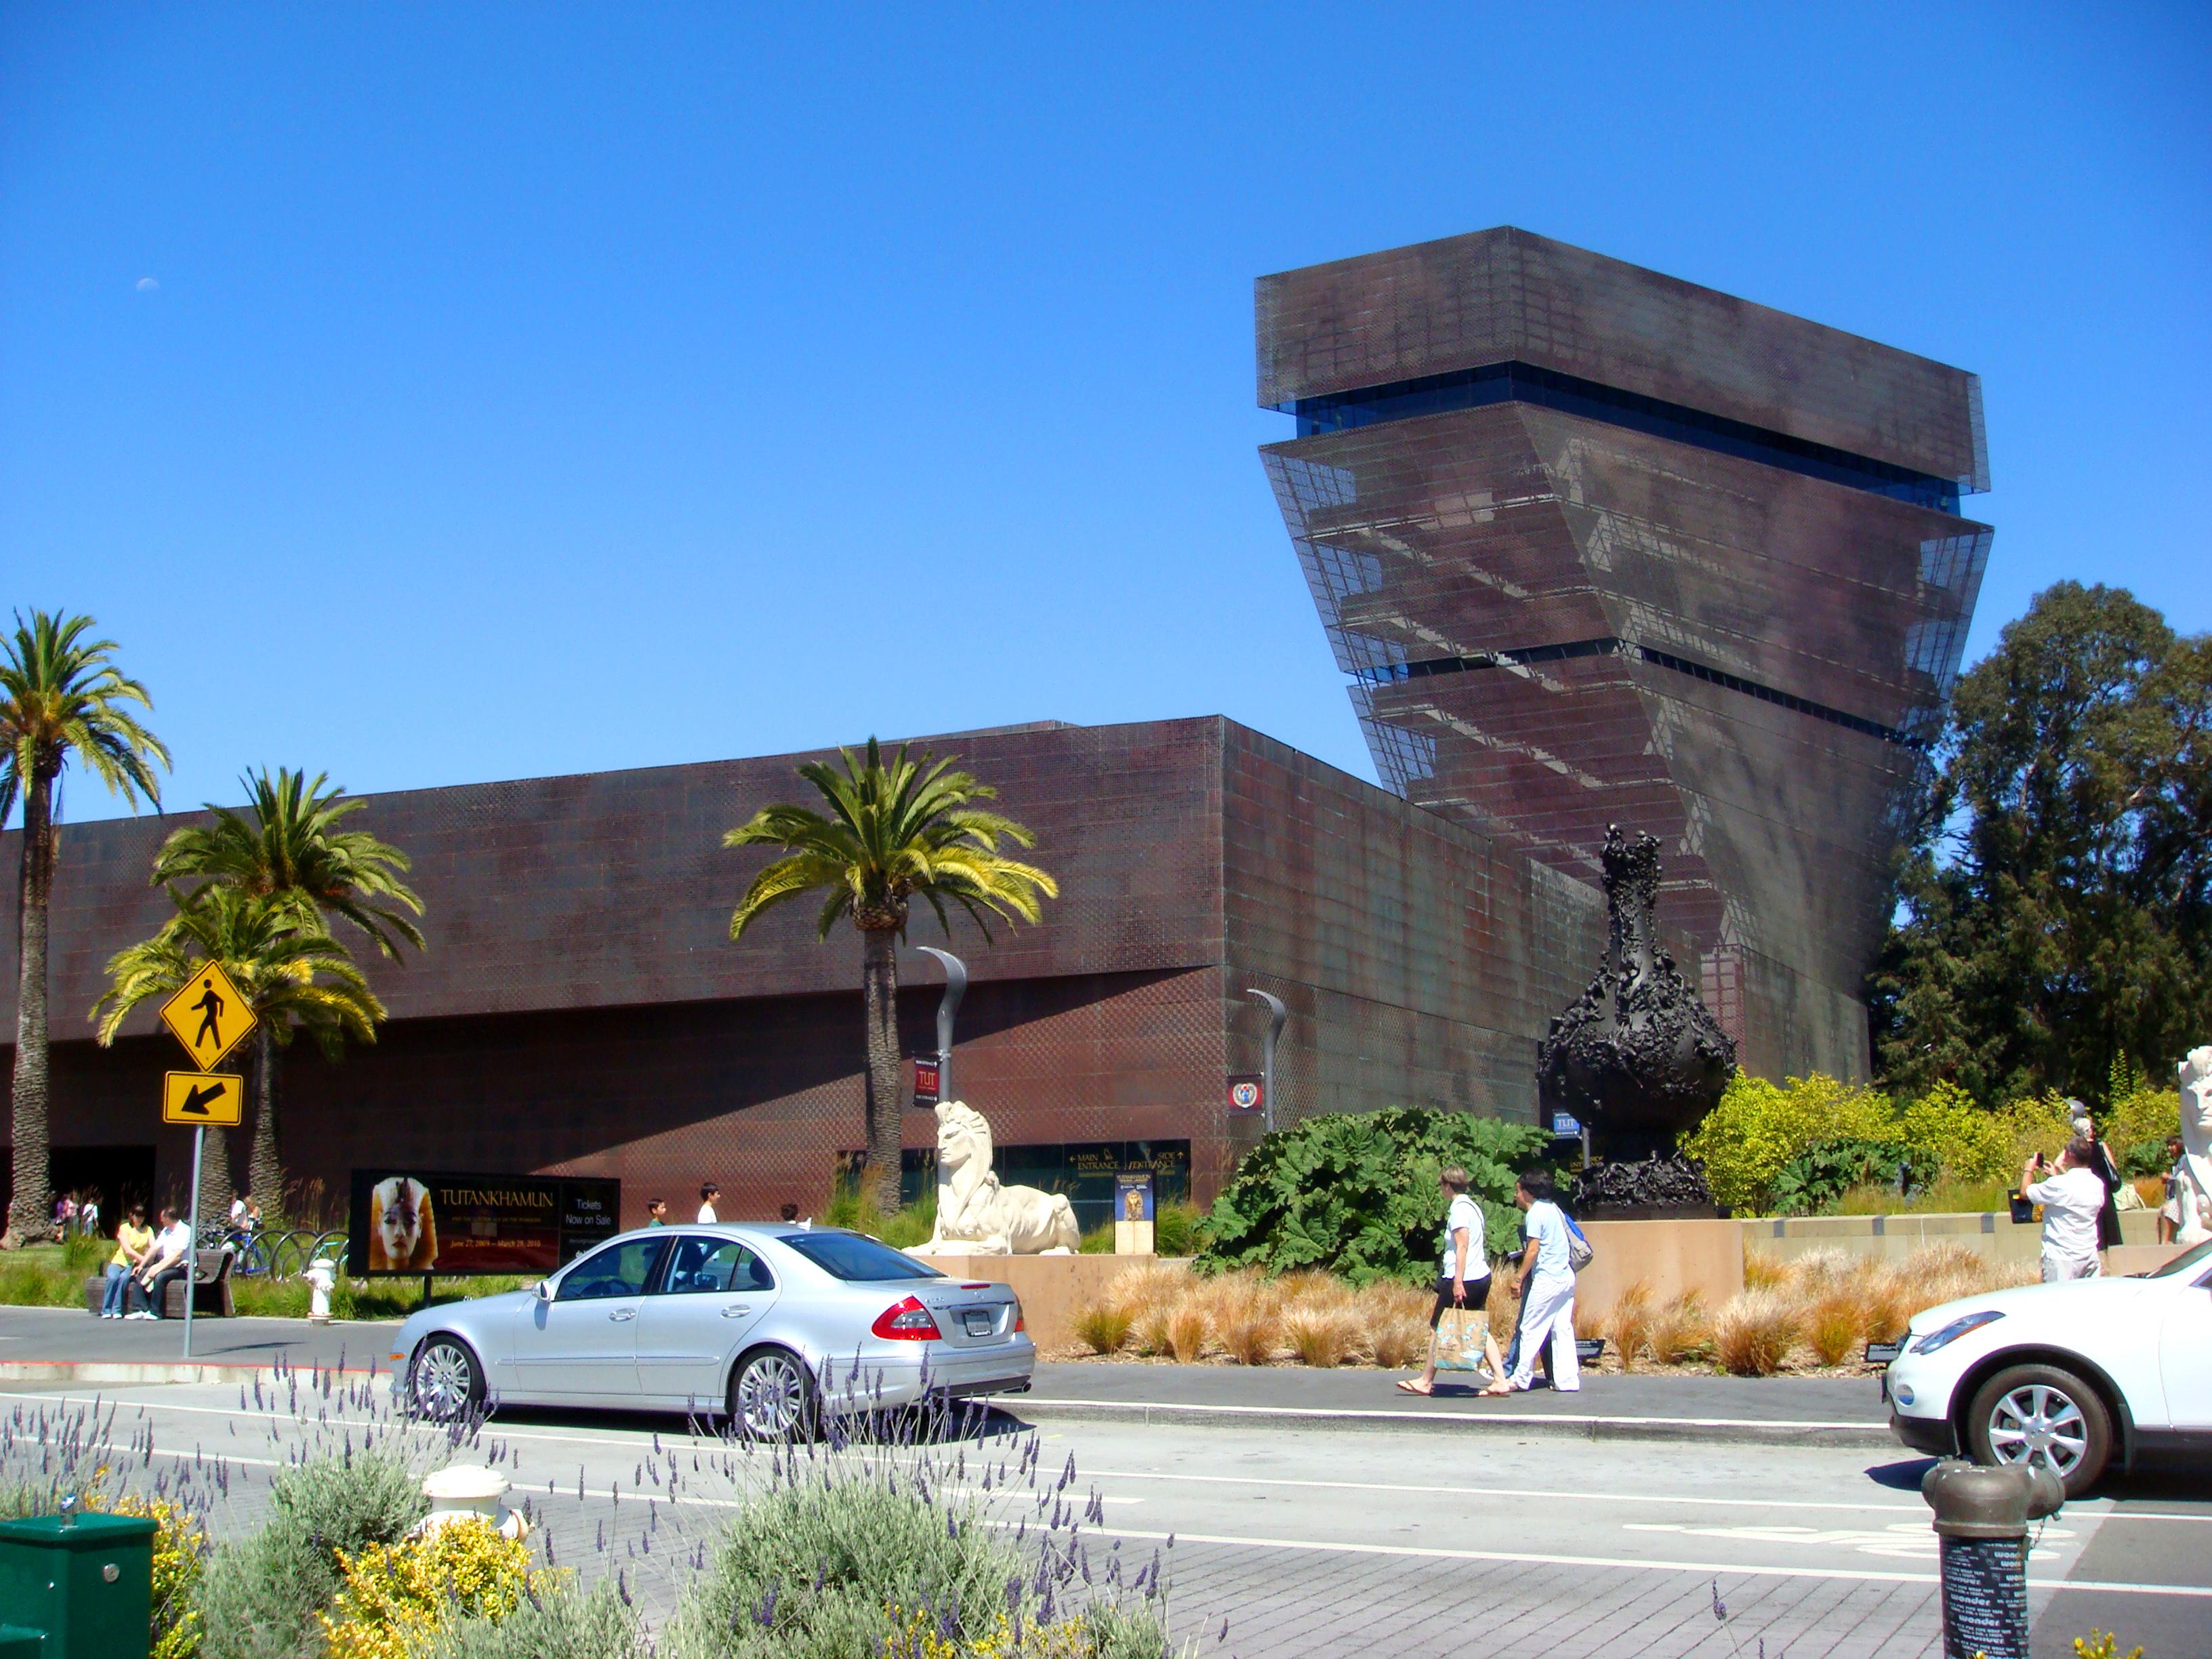 Architecture porn sfw metafilter for San francisco new museum